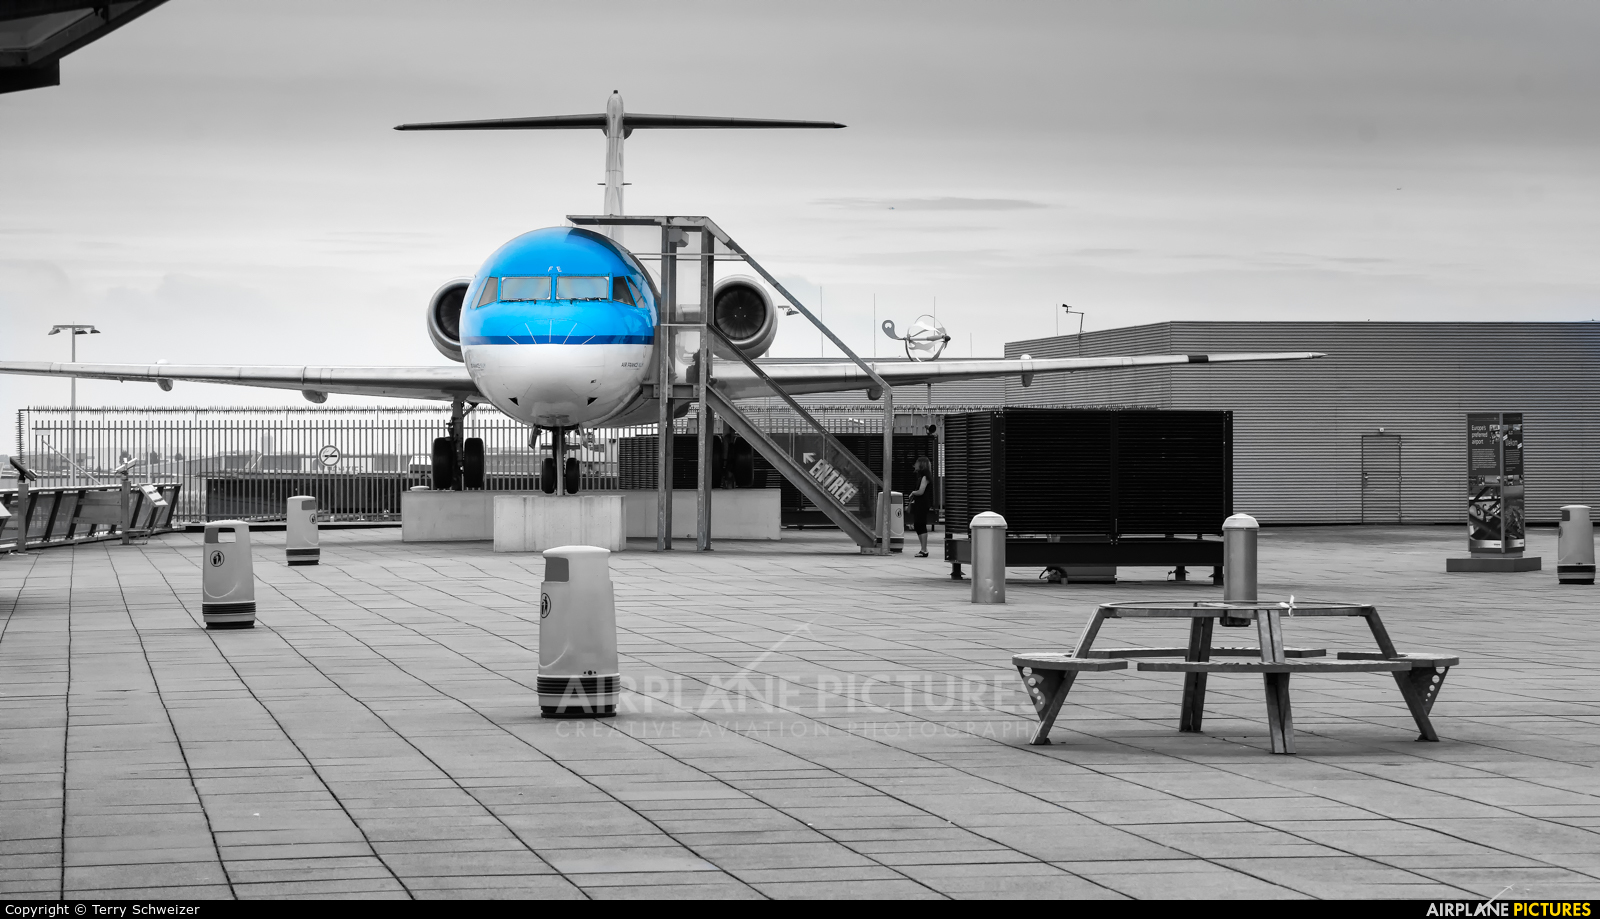 KLM Cityhopper PH-OFE aircraft at Amsterdam - Schiphol